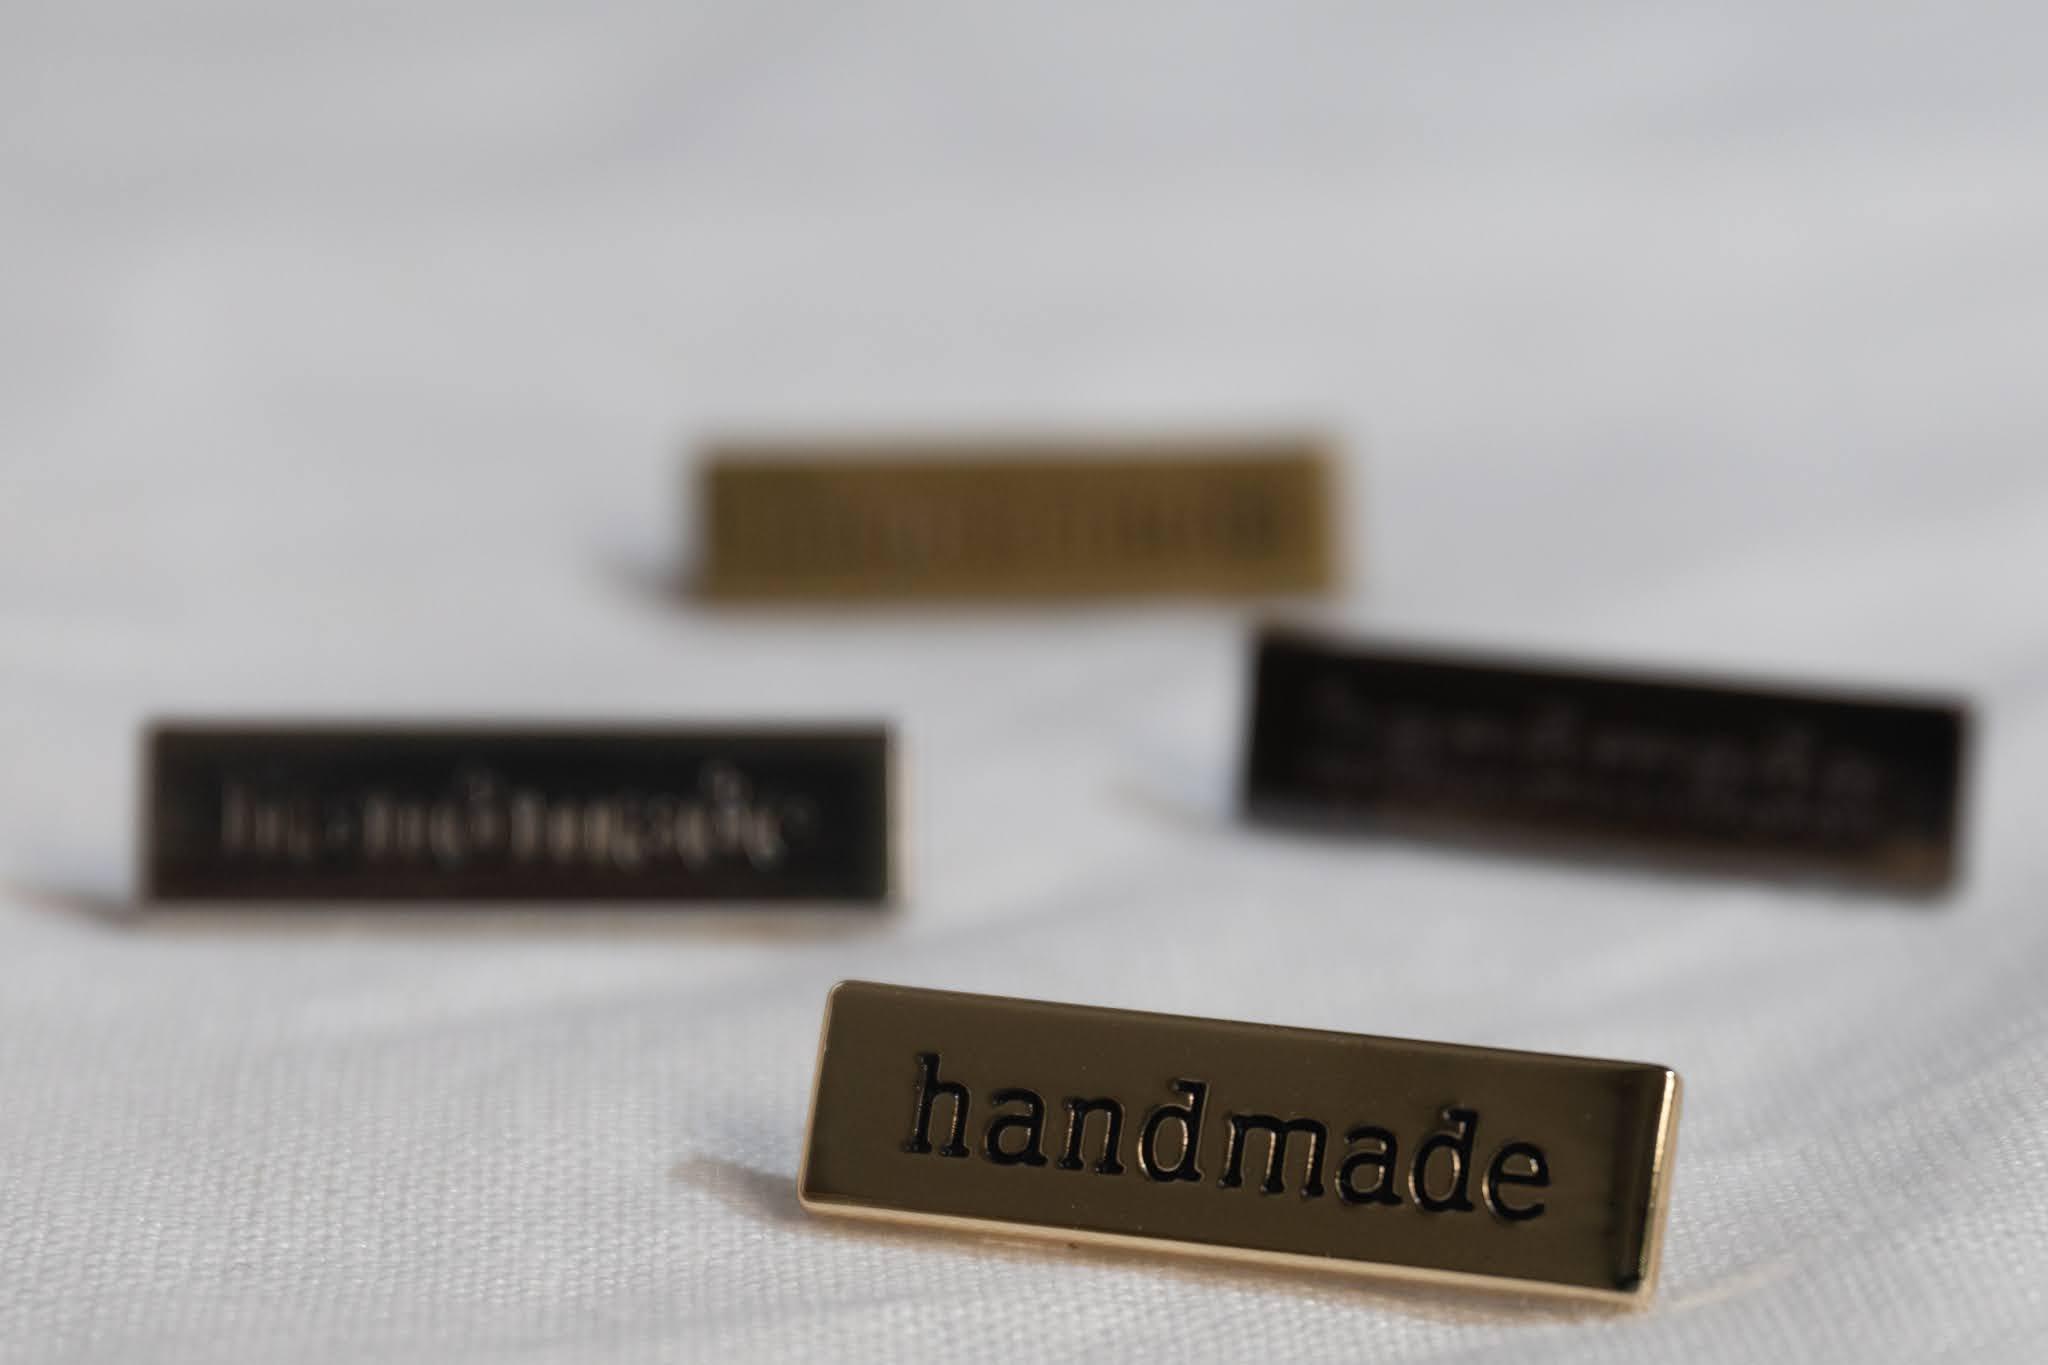 Handmade rintaneula